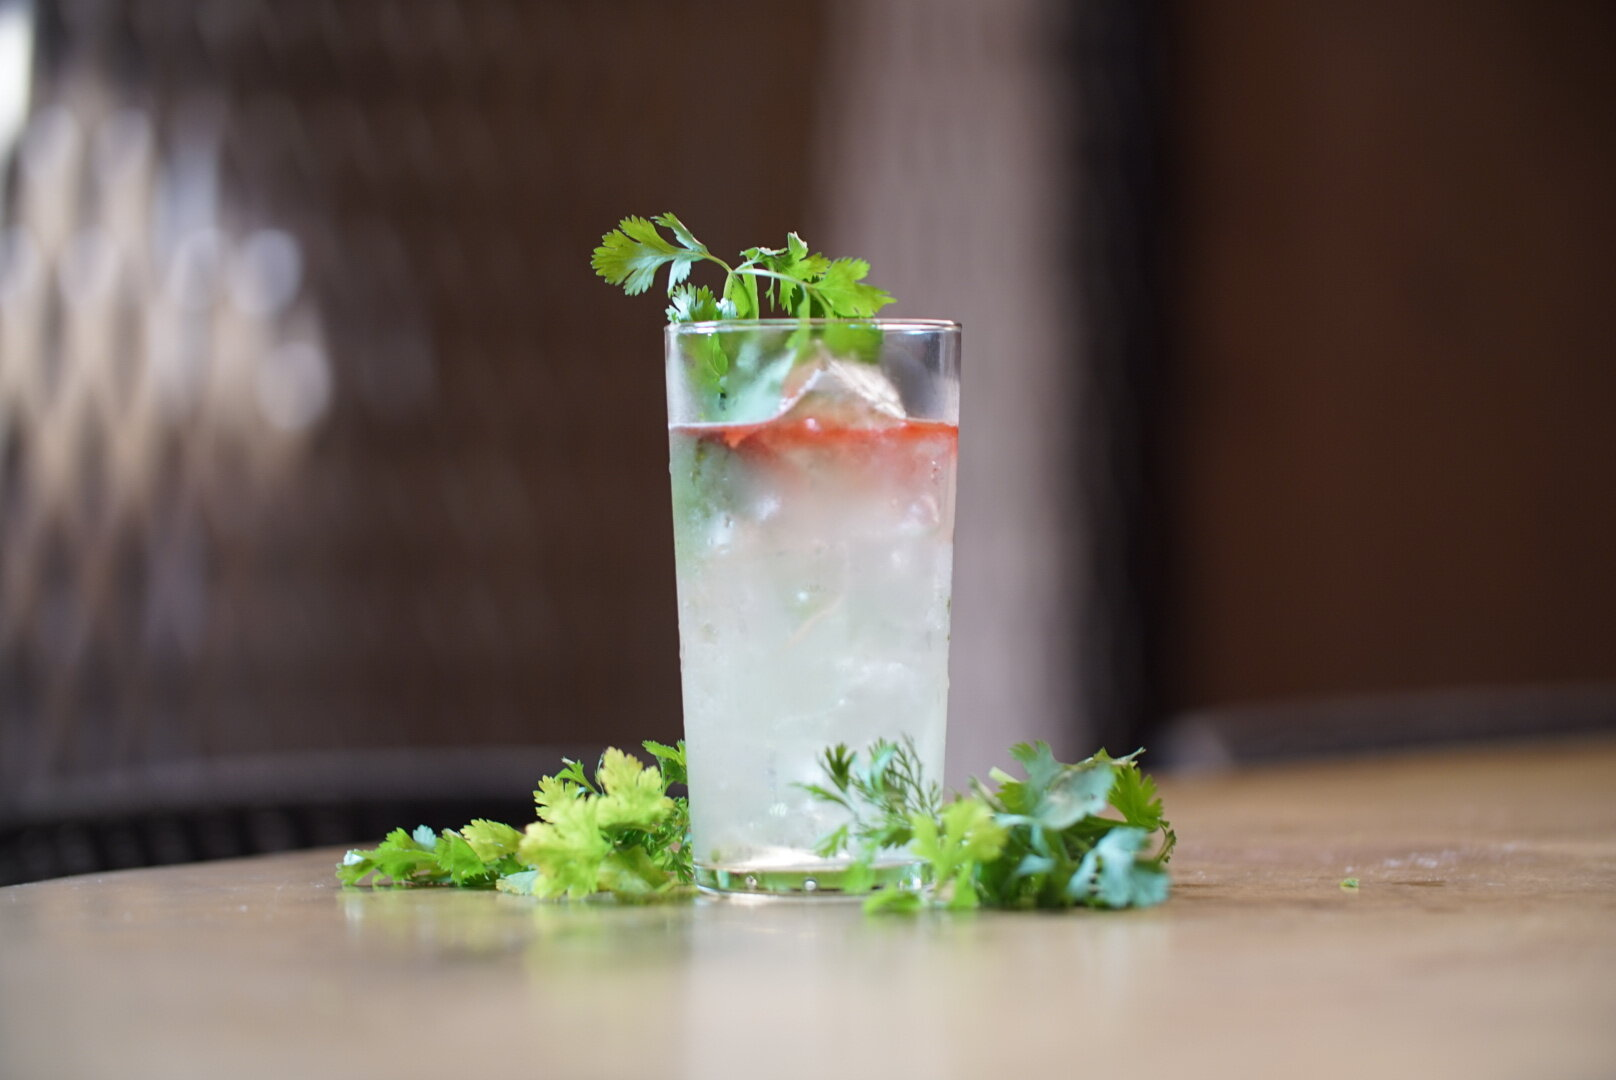 A cilantro cocktail that hopefully won't taste like soap to some. Photo: Emily Wong